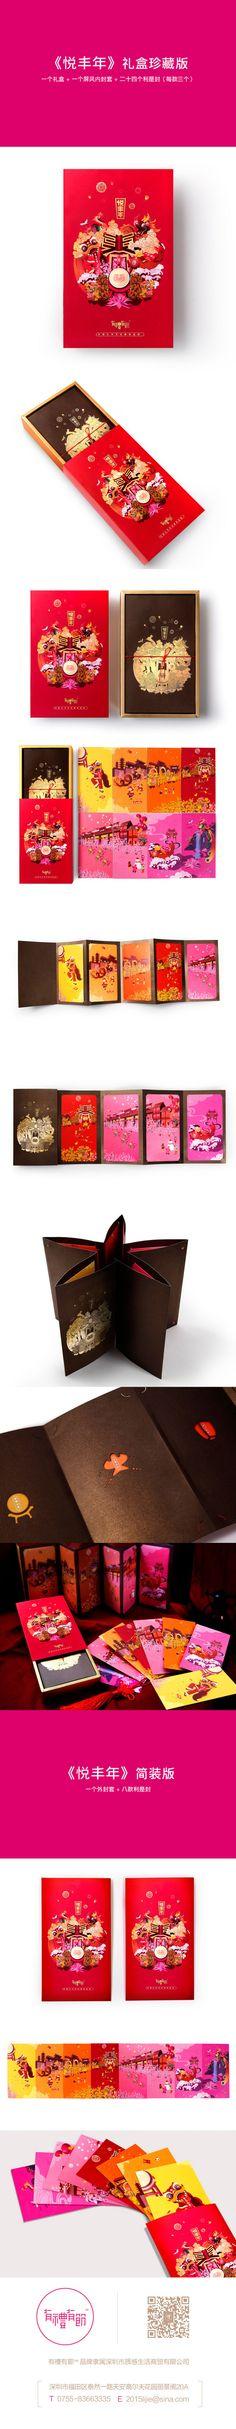 [有礼有节] 2015最文艺的利是封,温... Vintage Packaging, Brand Packaging, Packaging Design, Chinese Branding, Envelope Design, Red Envelope, Chinese New Year Design, Japanese Packaging, Red Packet